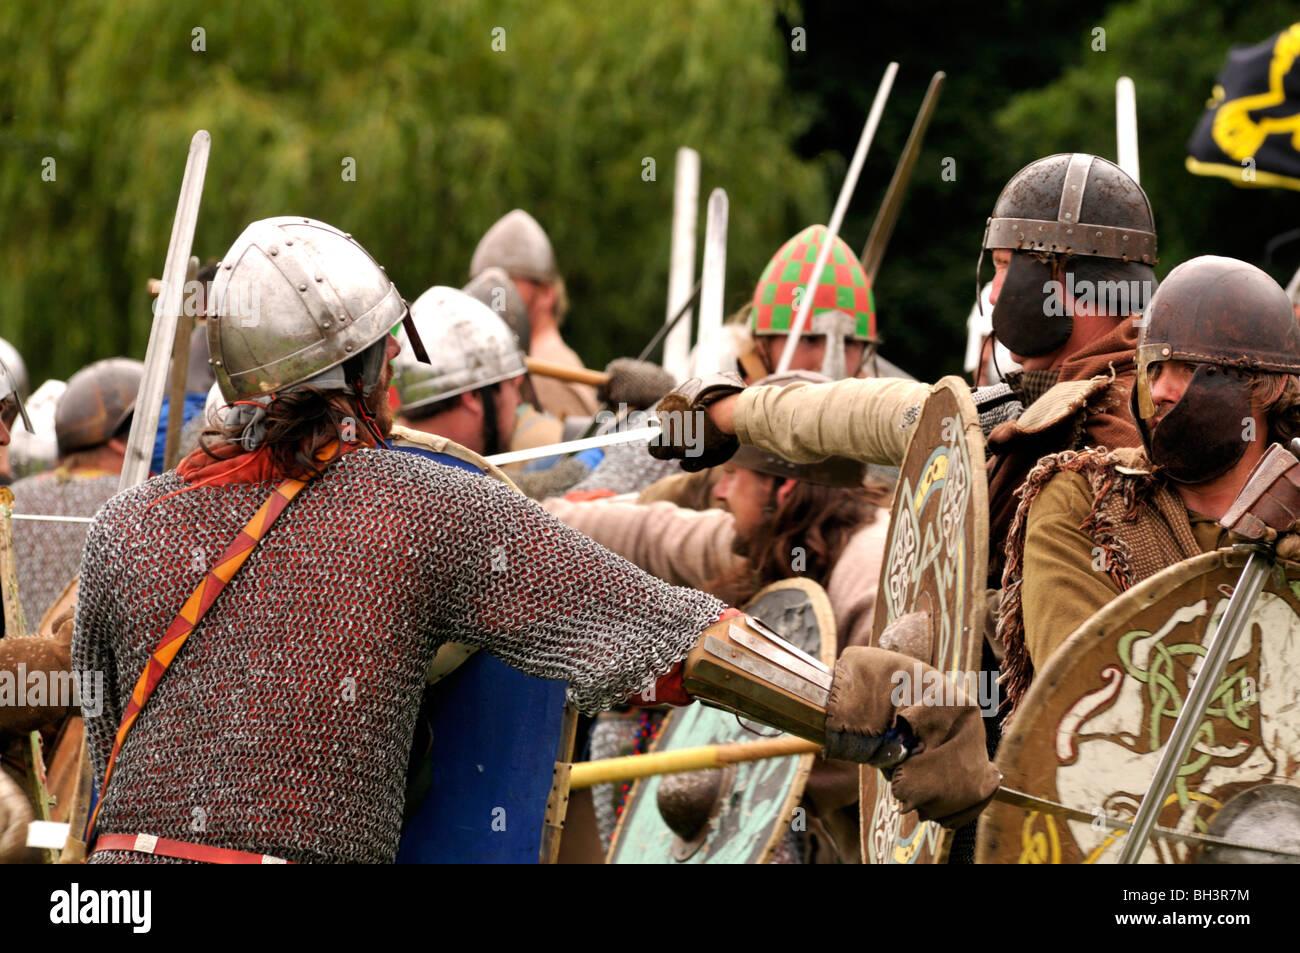 Historical reenactment of Viking invasion - Stock Image